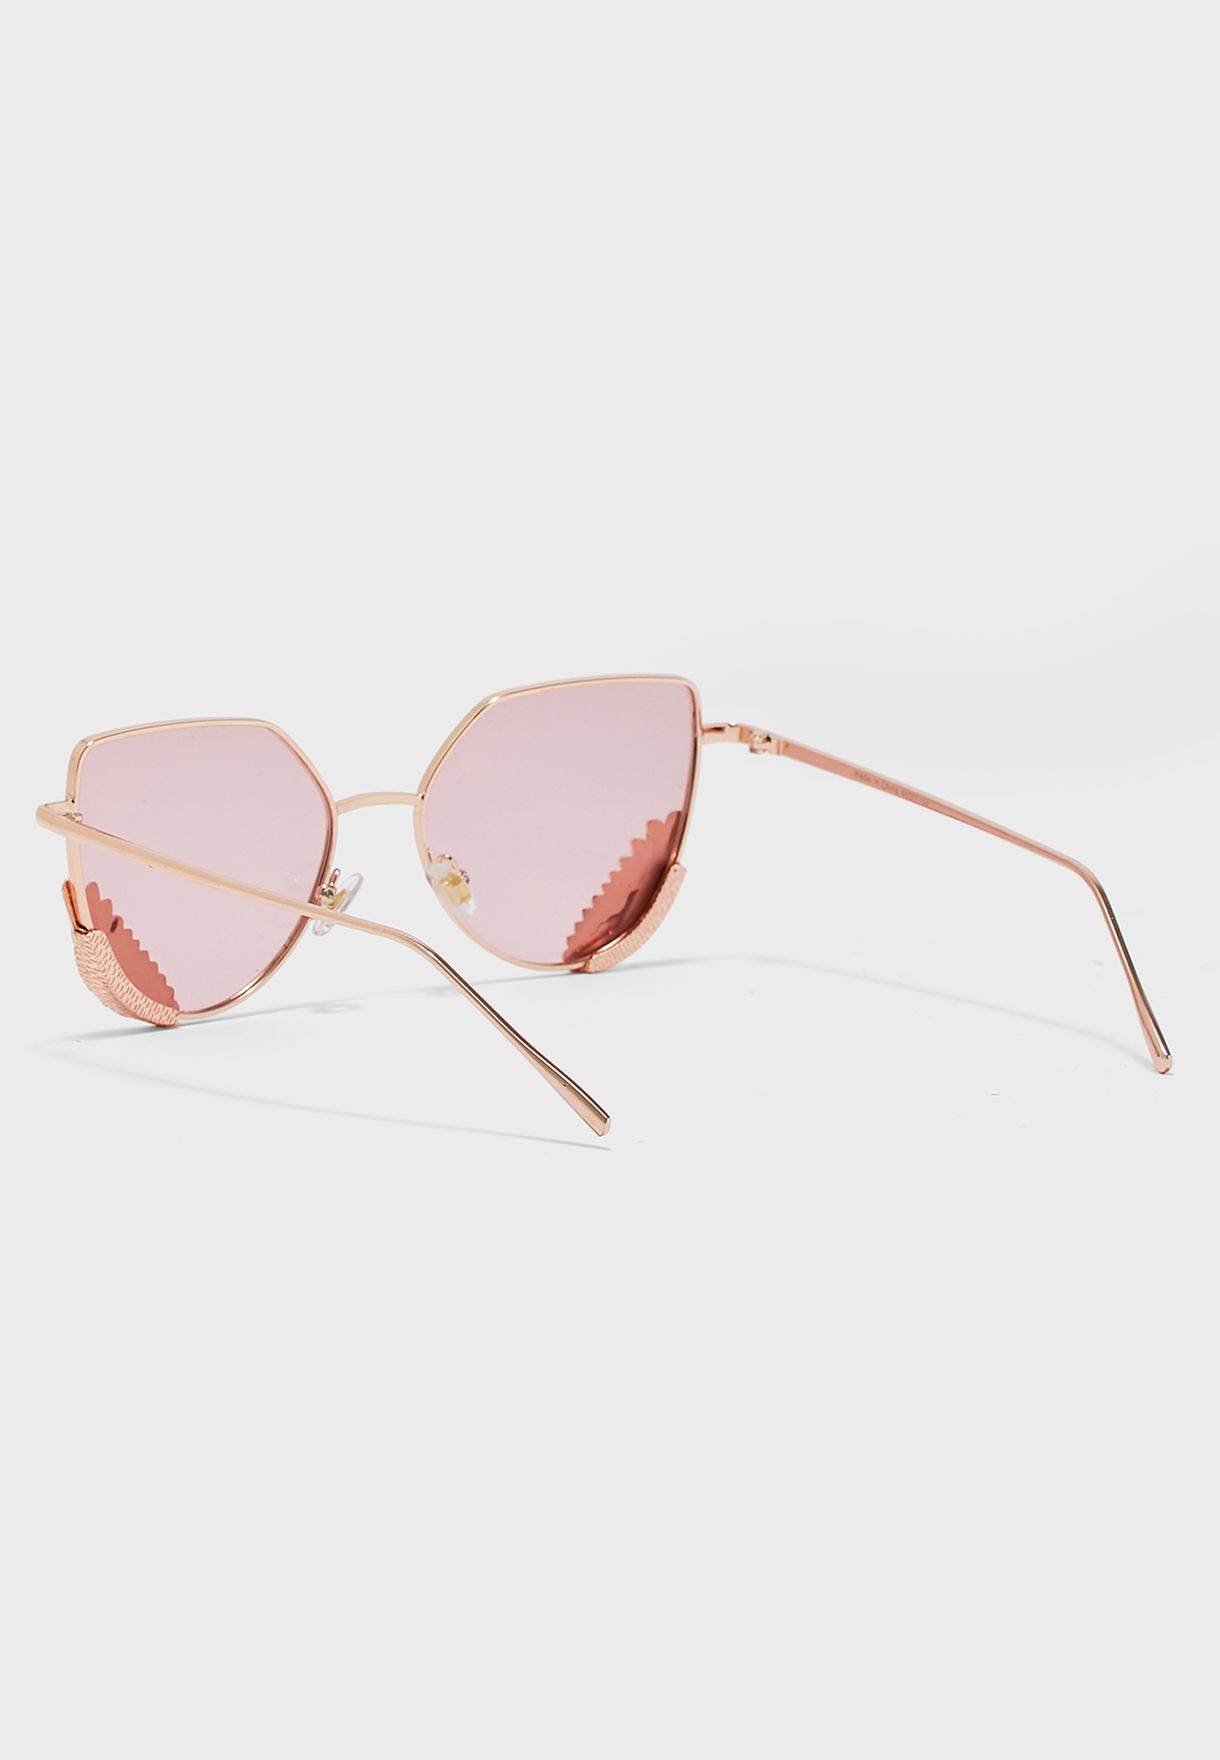 Hexa Stunner Sunglasses